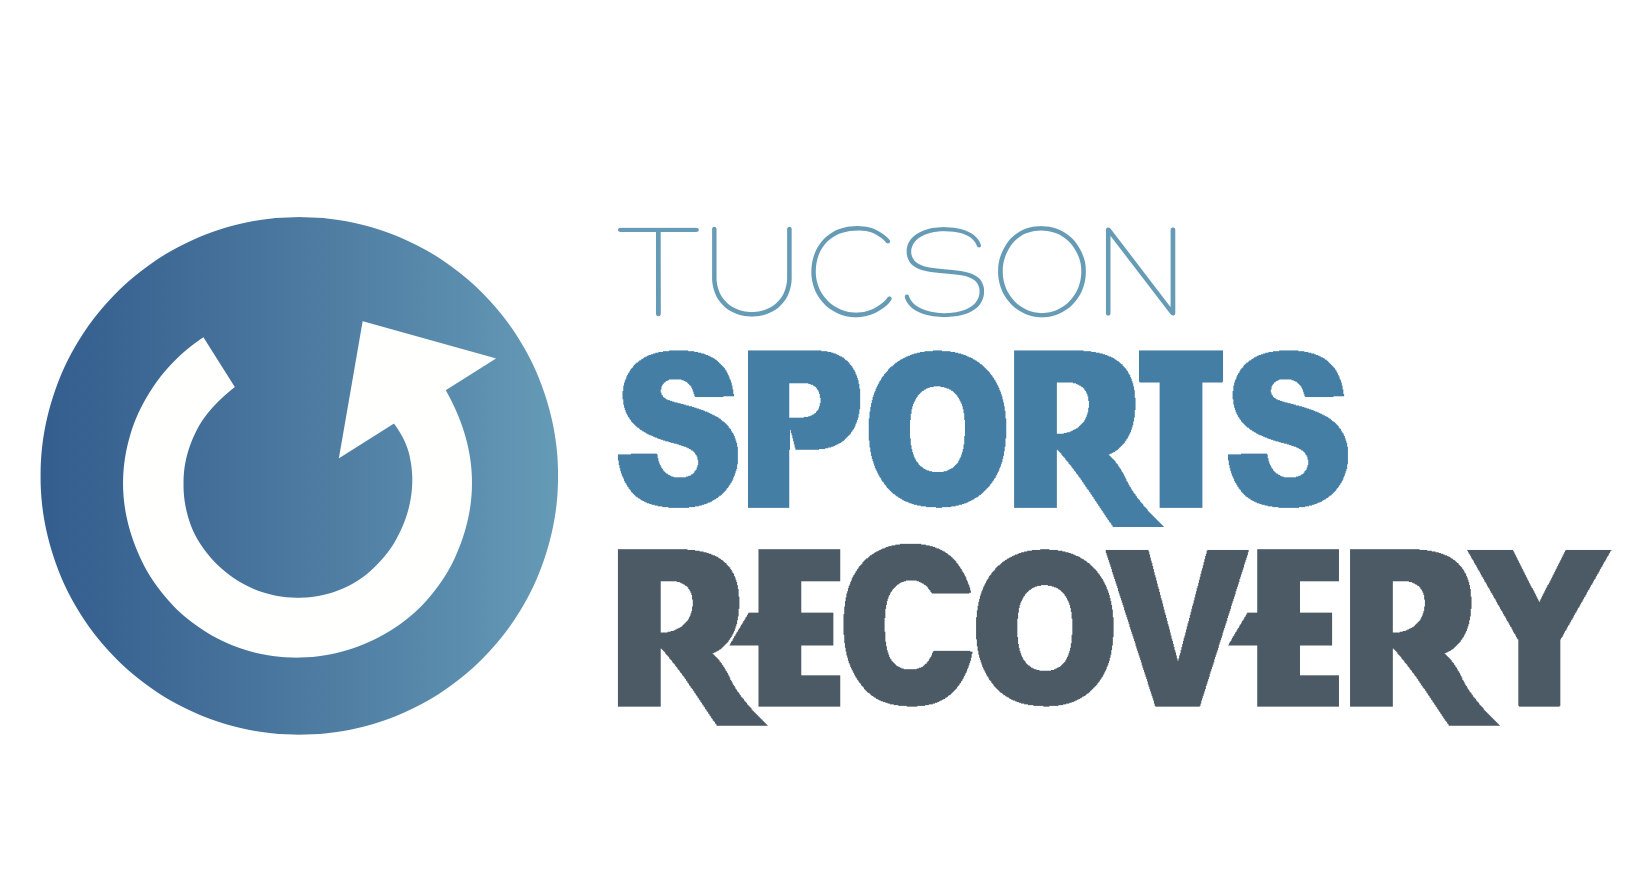 Tucson Massage